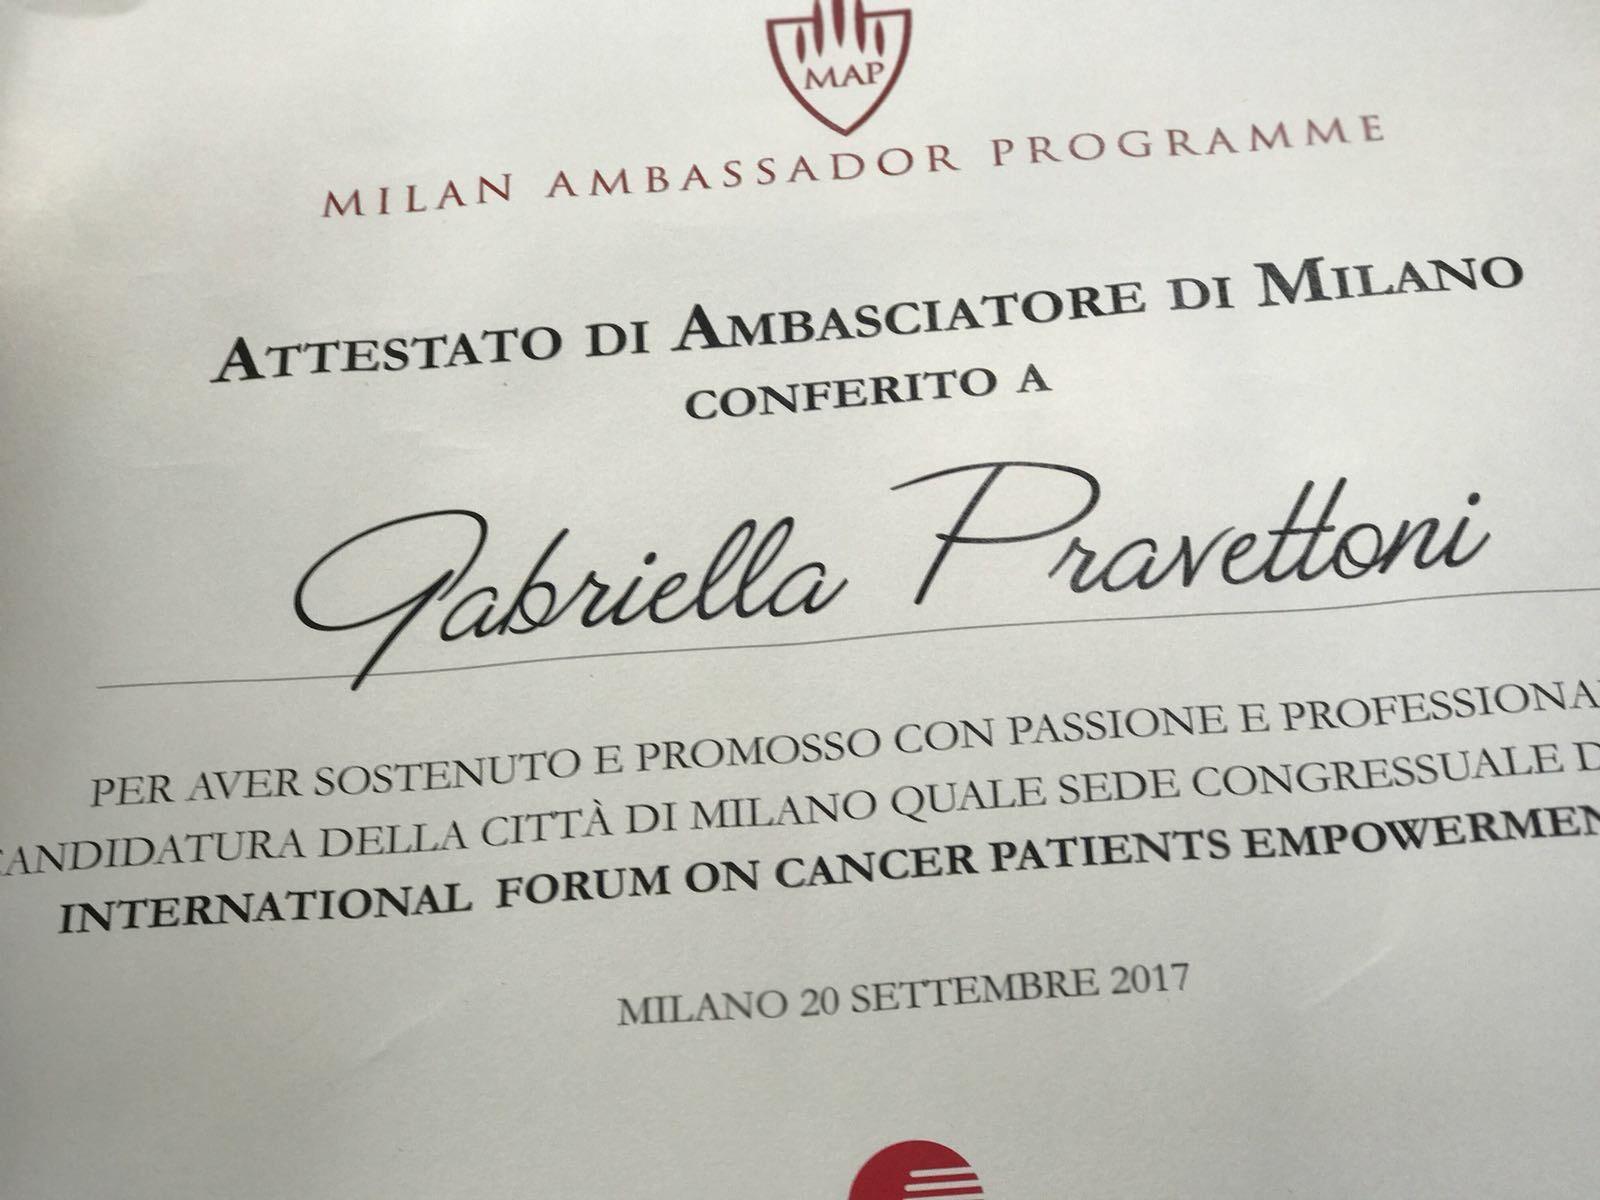 Milan Ambassador Programme 2